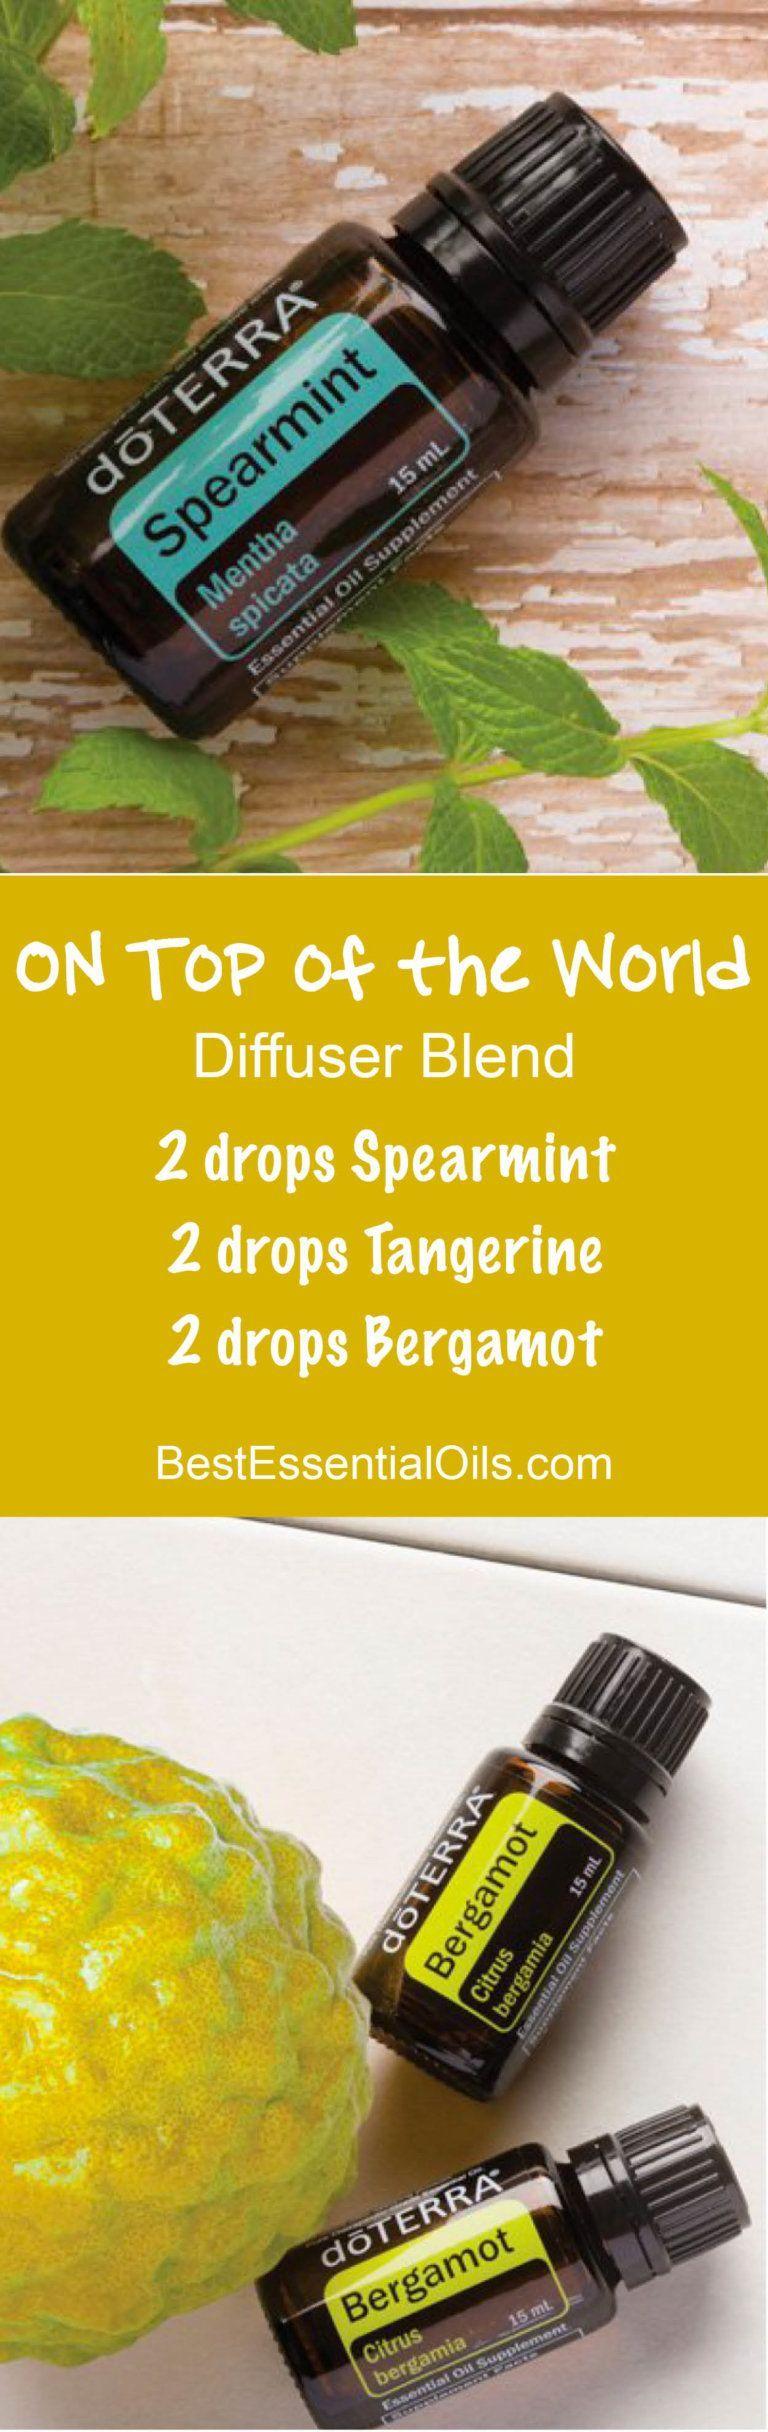 doTERRA Uplifting Diffuser Blends   Spearmint essential oil, Tangerine essential oil, Best essential oils